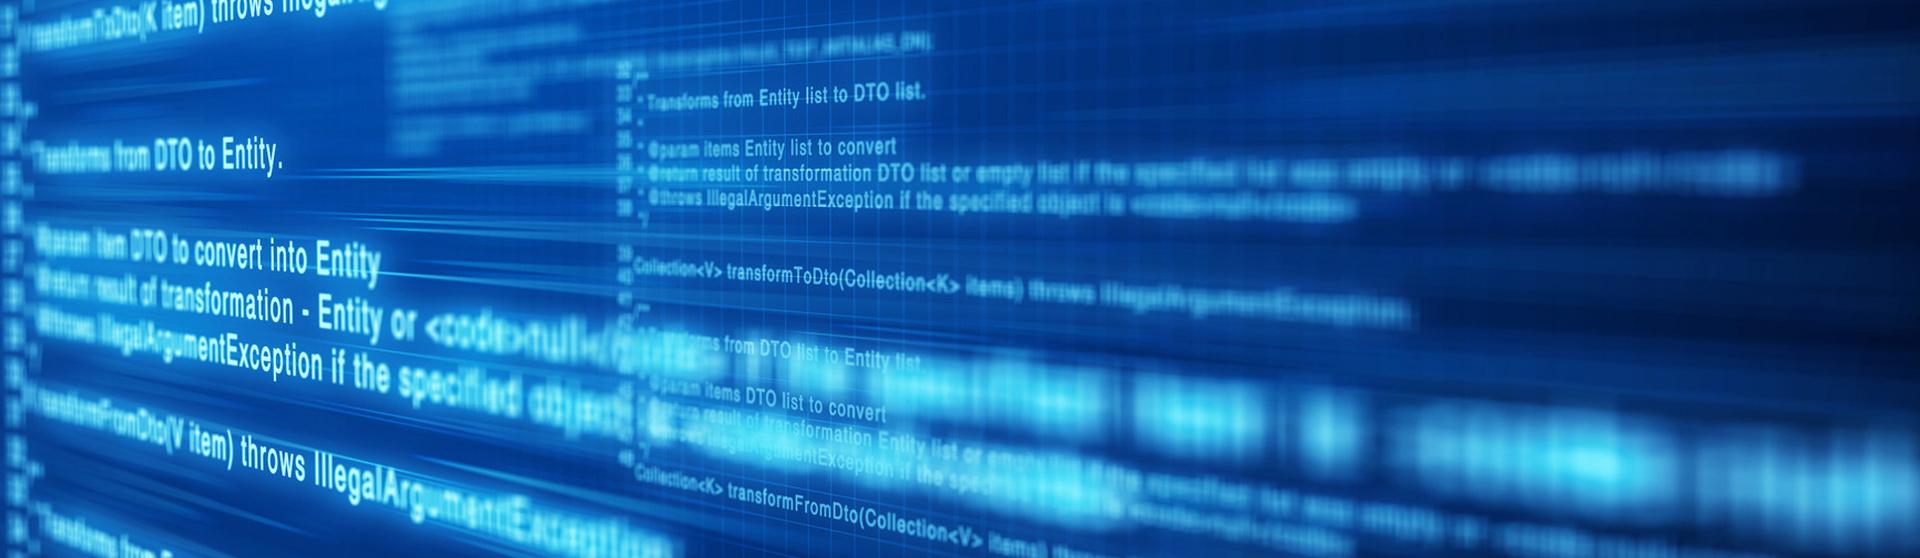 software_bg